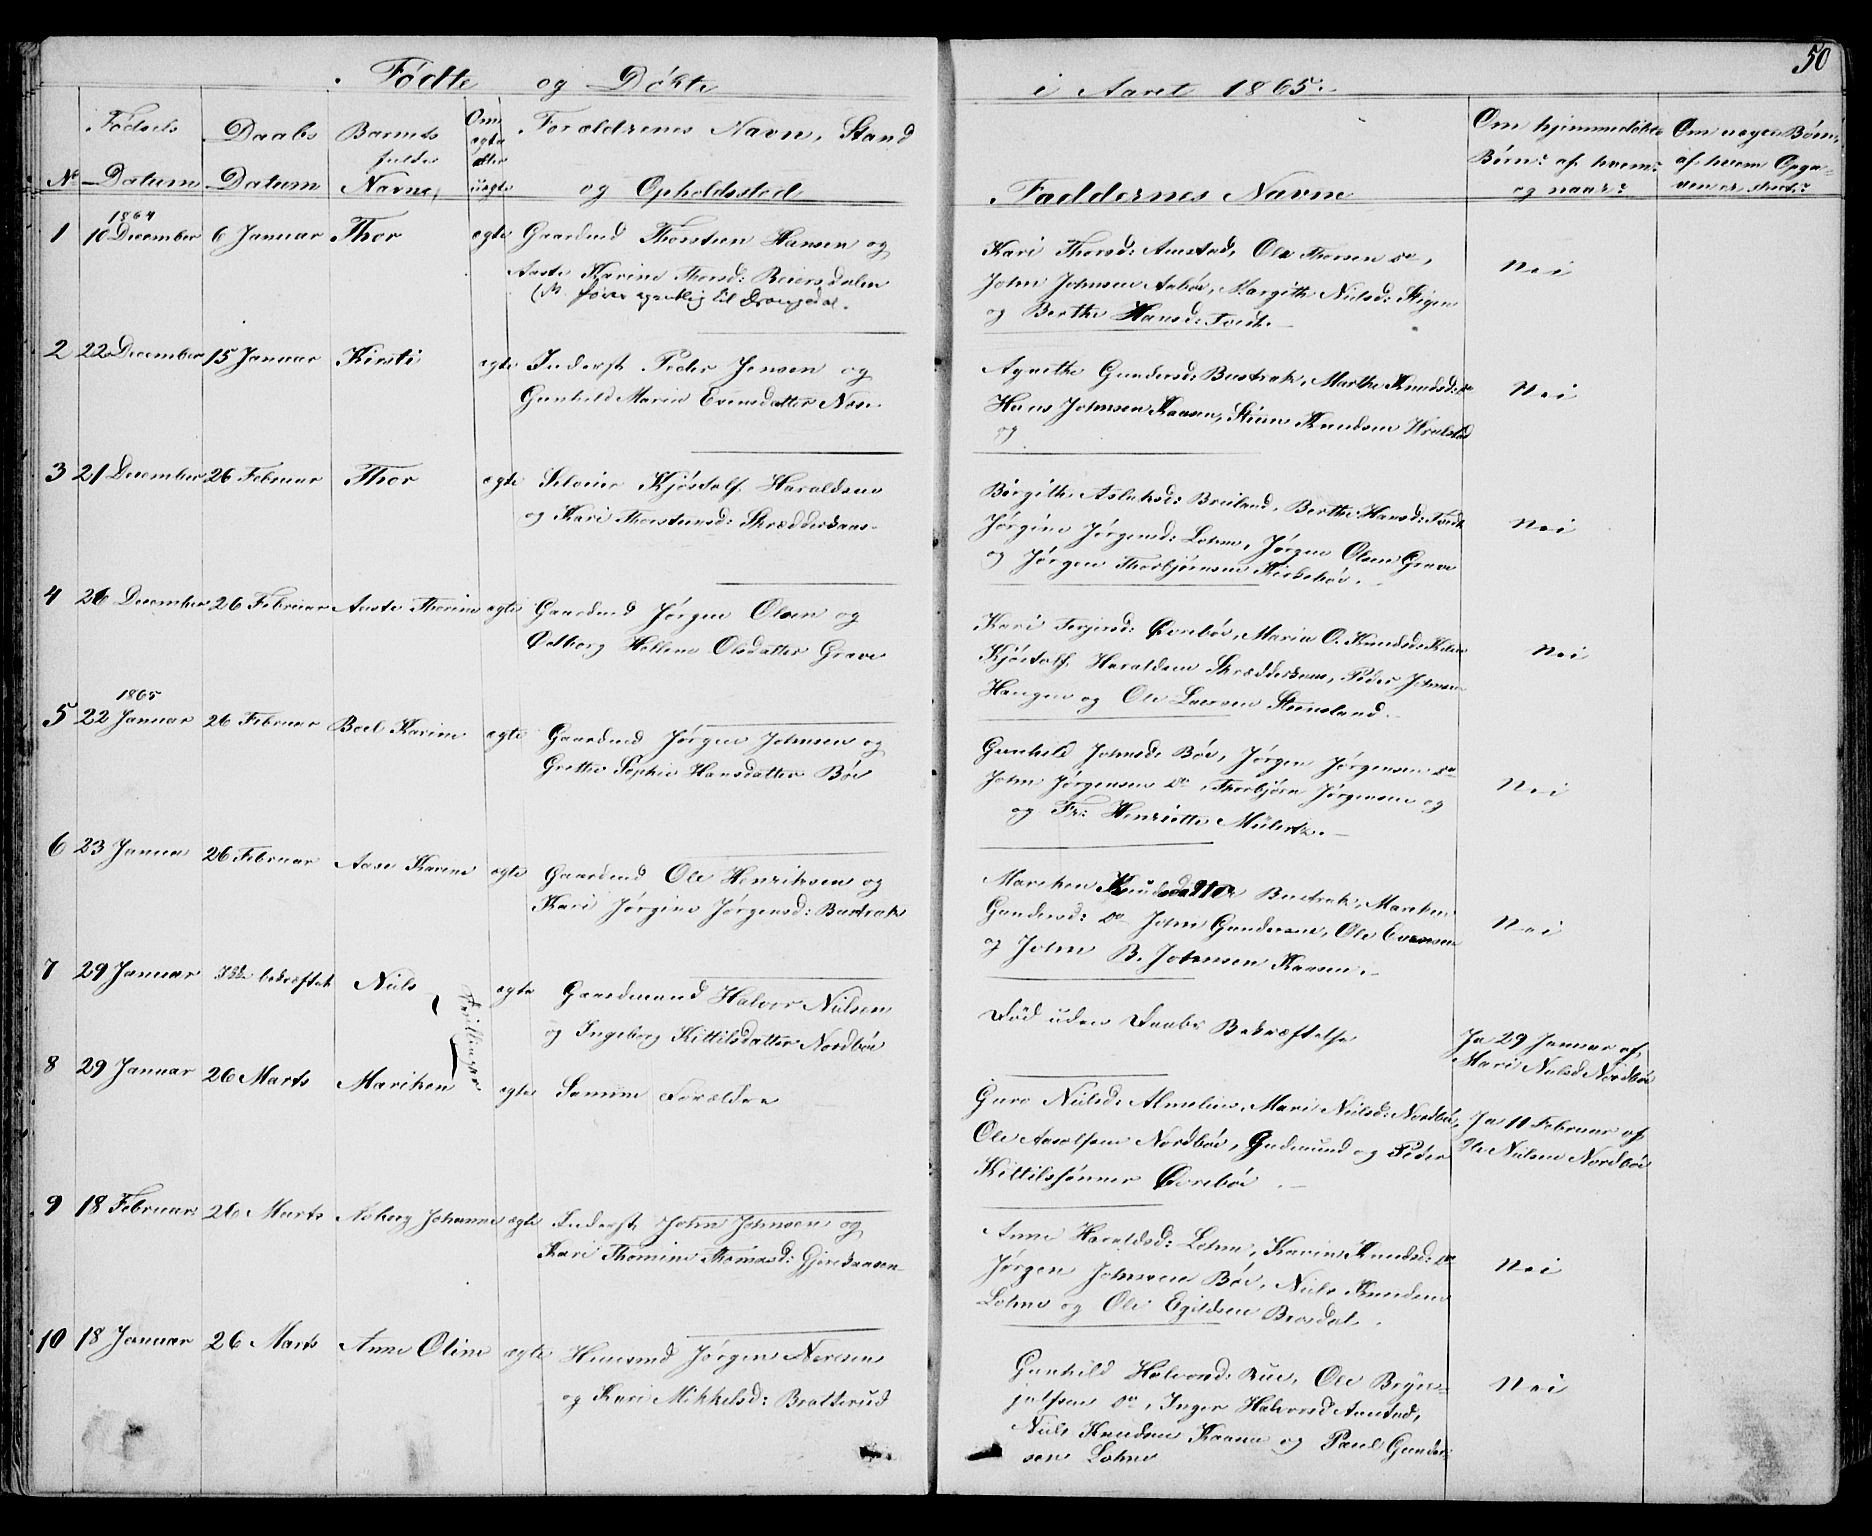 SAKO, Drangedal kirkebøker, G/Gb/L0001: Klokkerbok nr. II 1, 1856-1894, s. 50